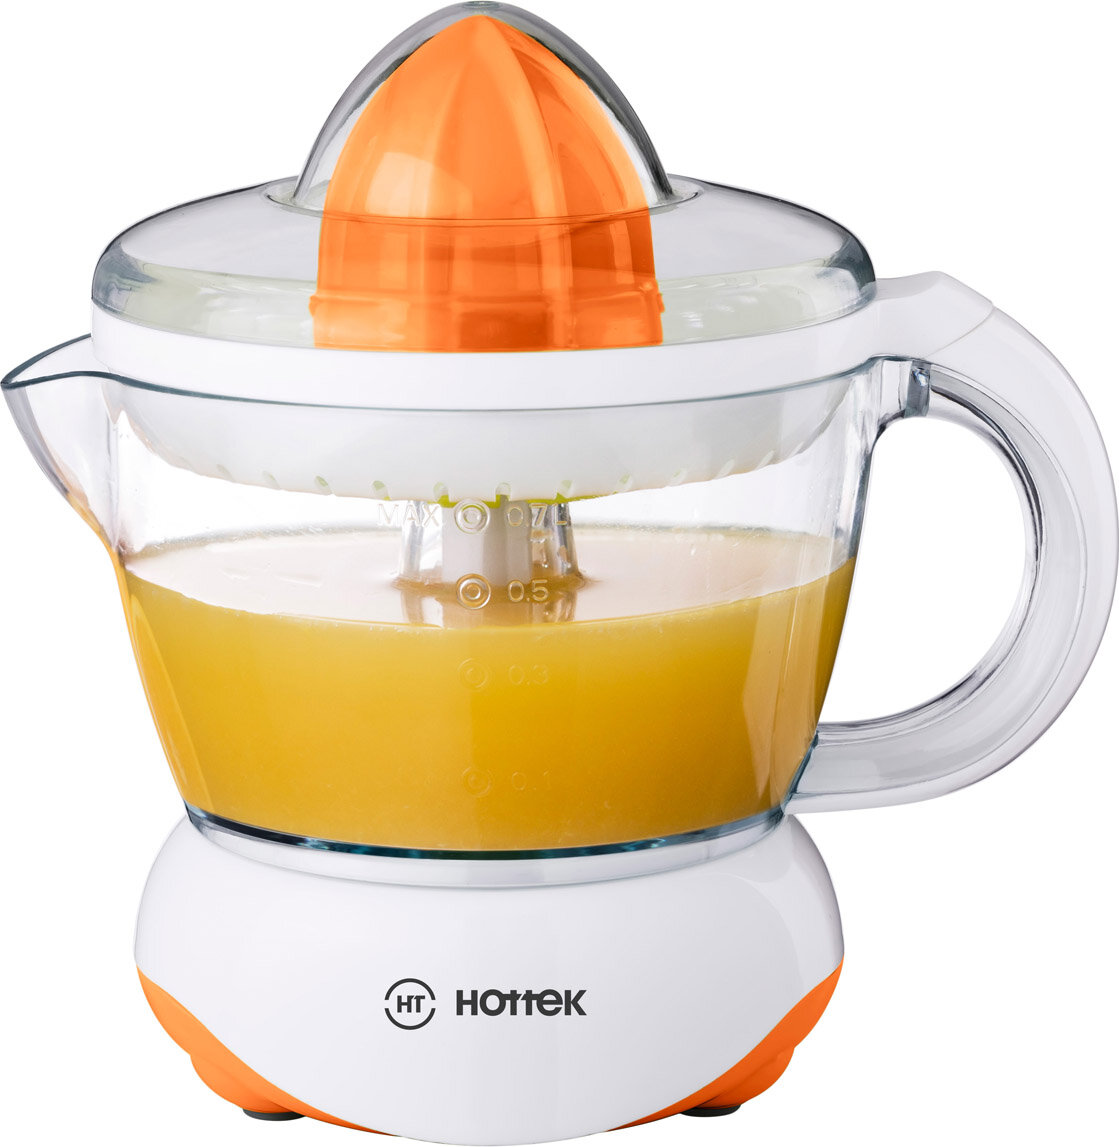 Соковыжималка Hottek ht-978-003, 700 мл оранжевый